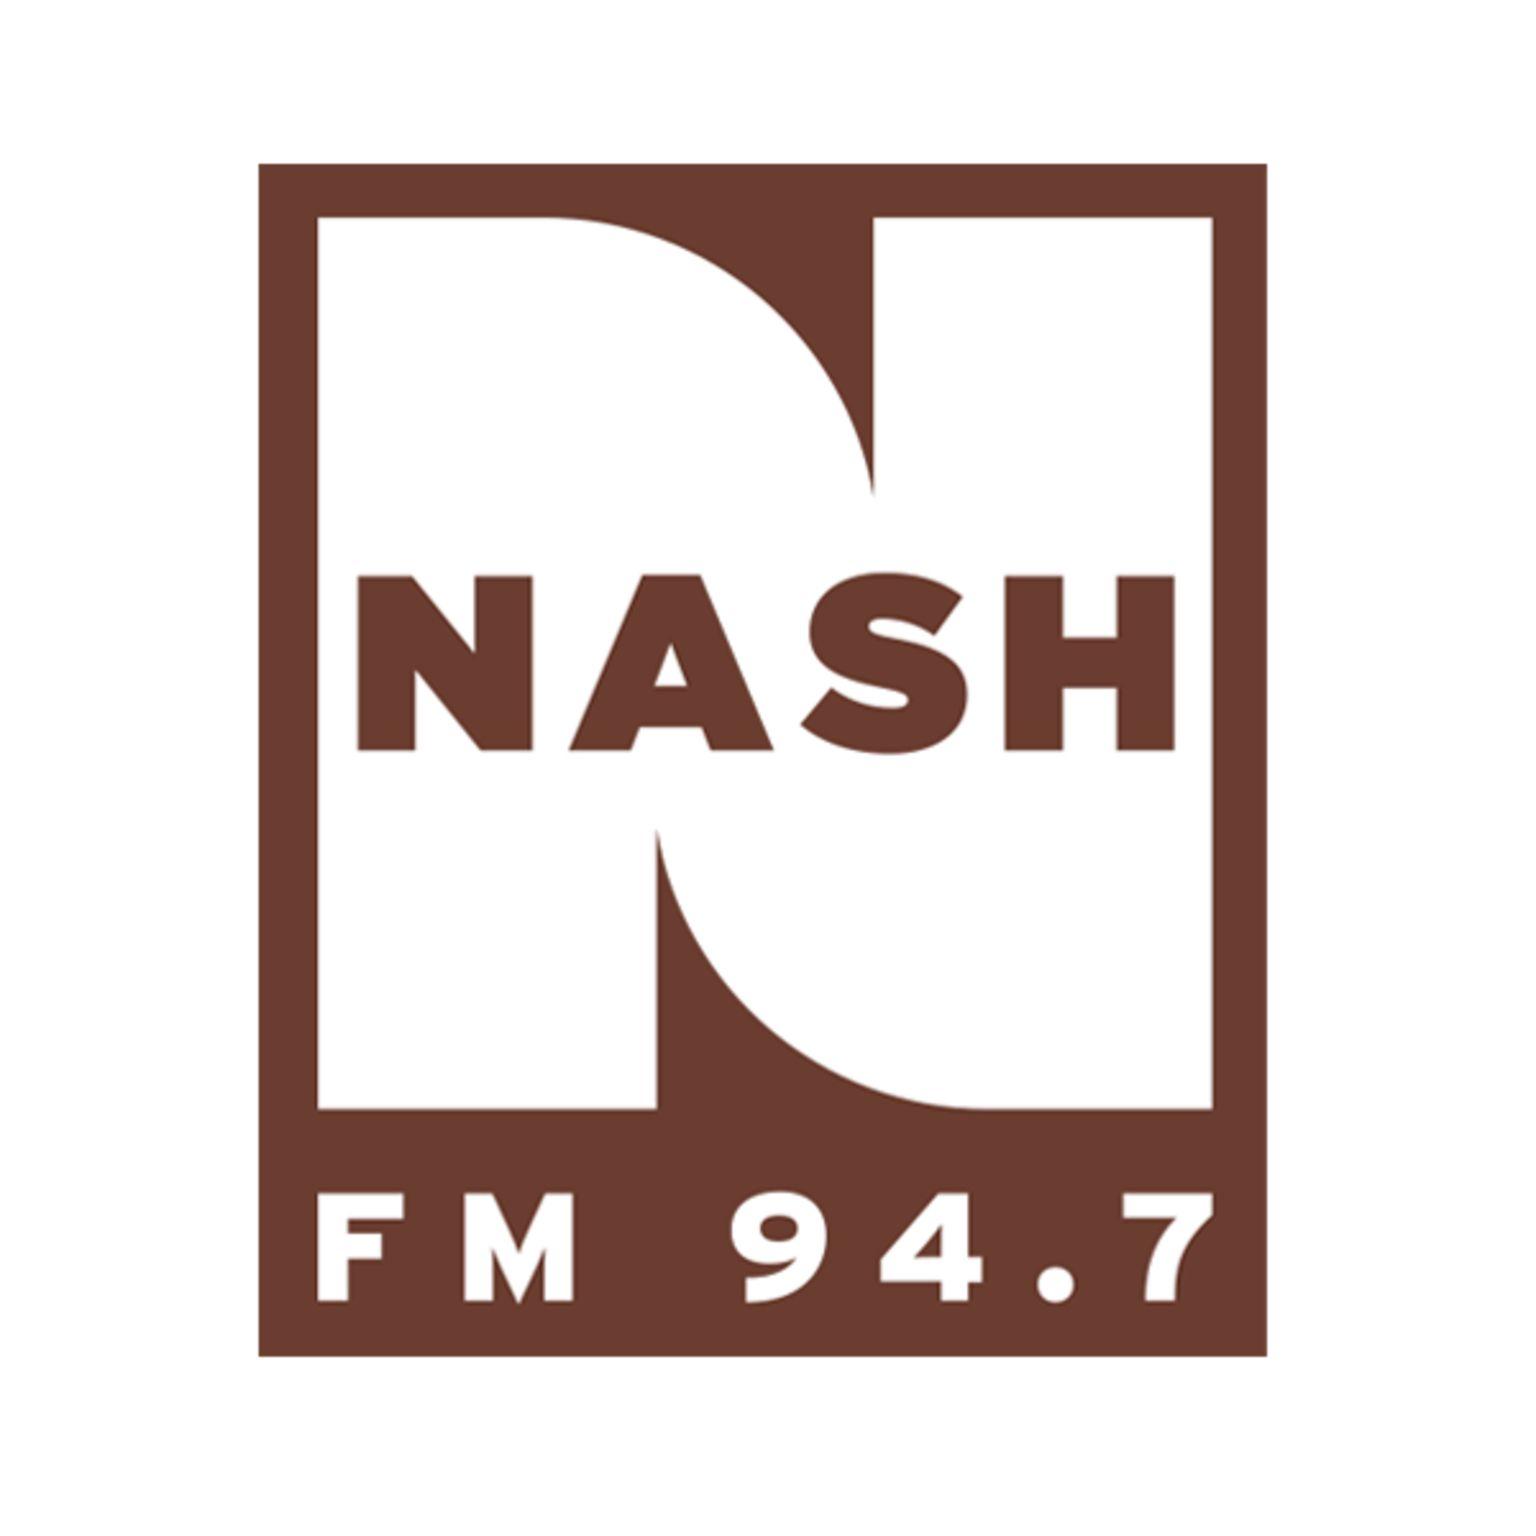 I\'m listening to NASH FM 94.7, America\'s Country Station: New York ...